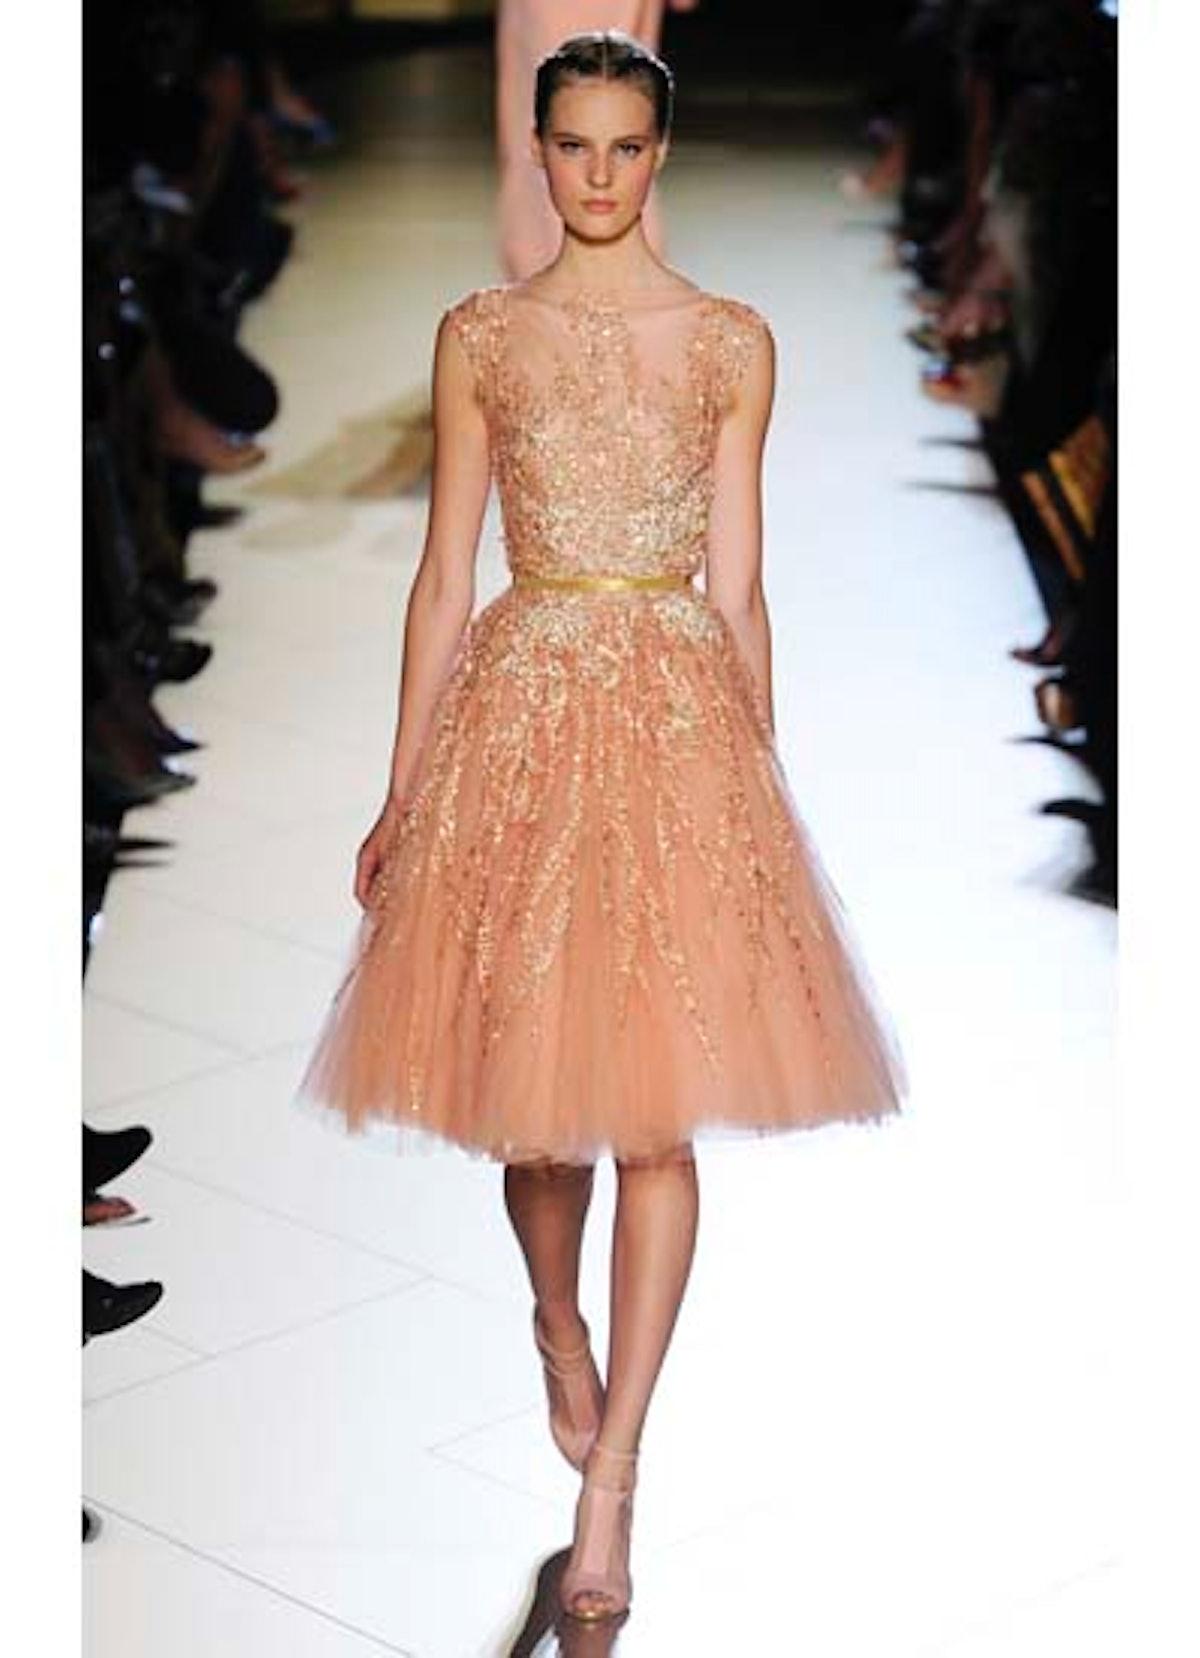 fass-elie-saab-couture-2012-runway-18-v.jpg